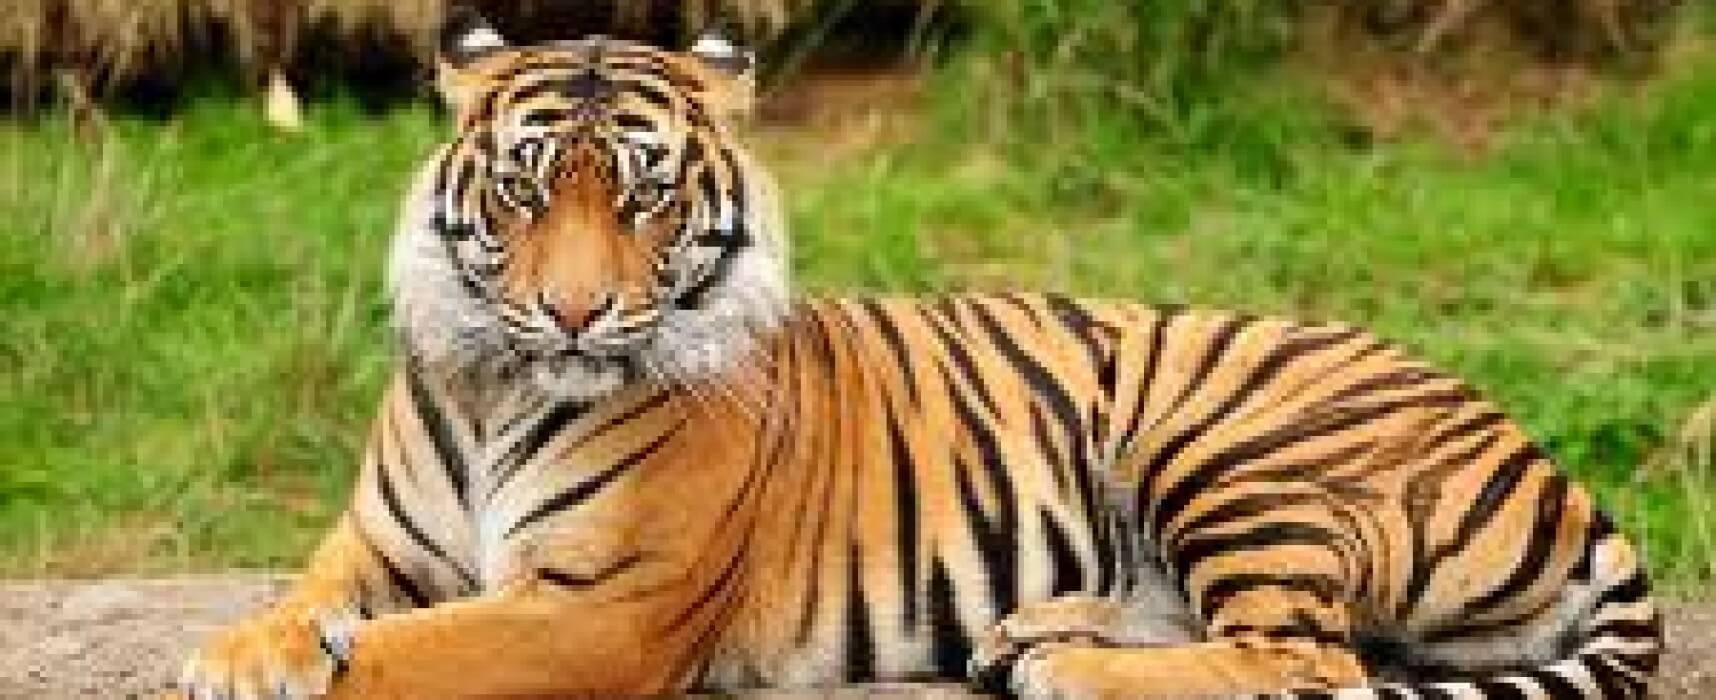 The Black Striped Animal